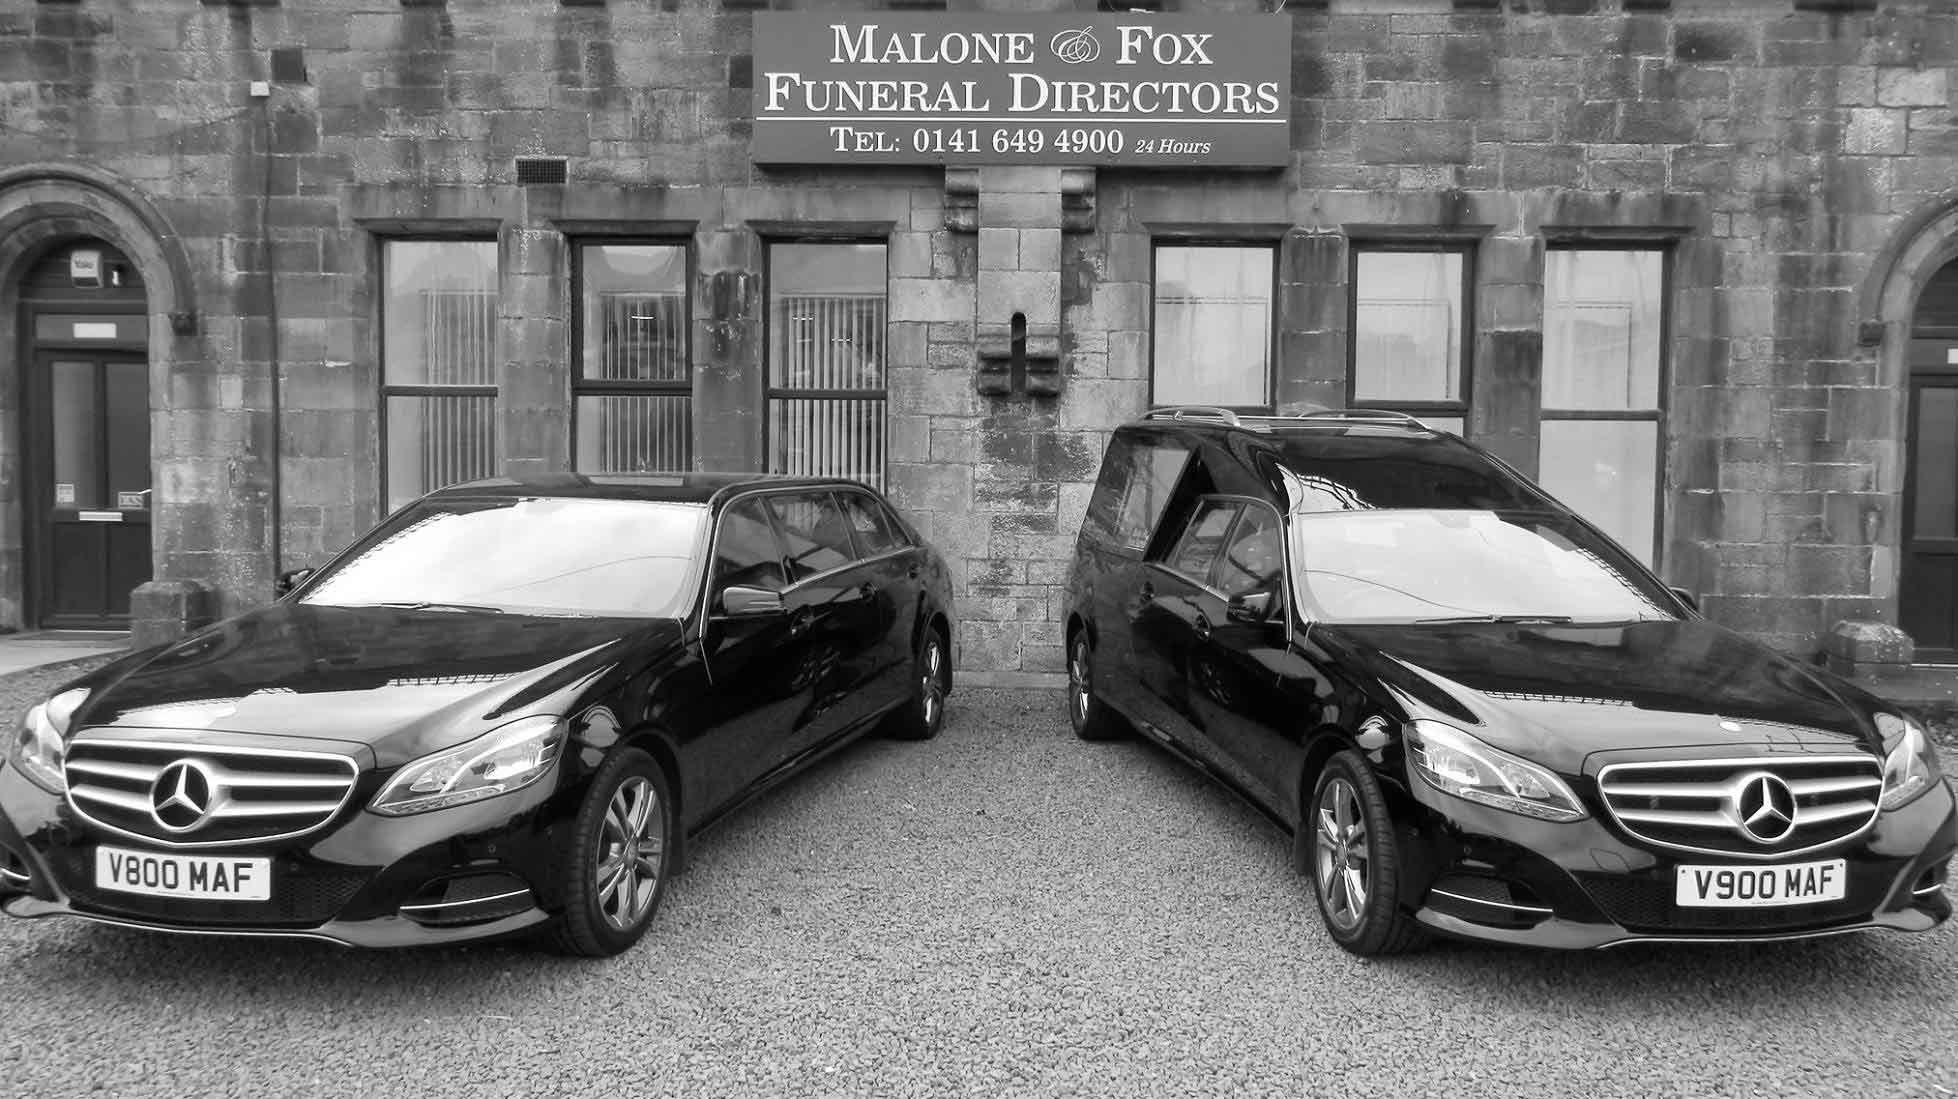 Malone & Fox